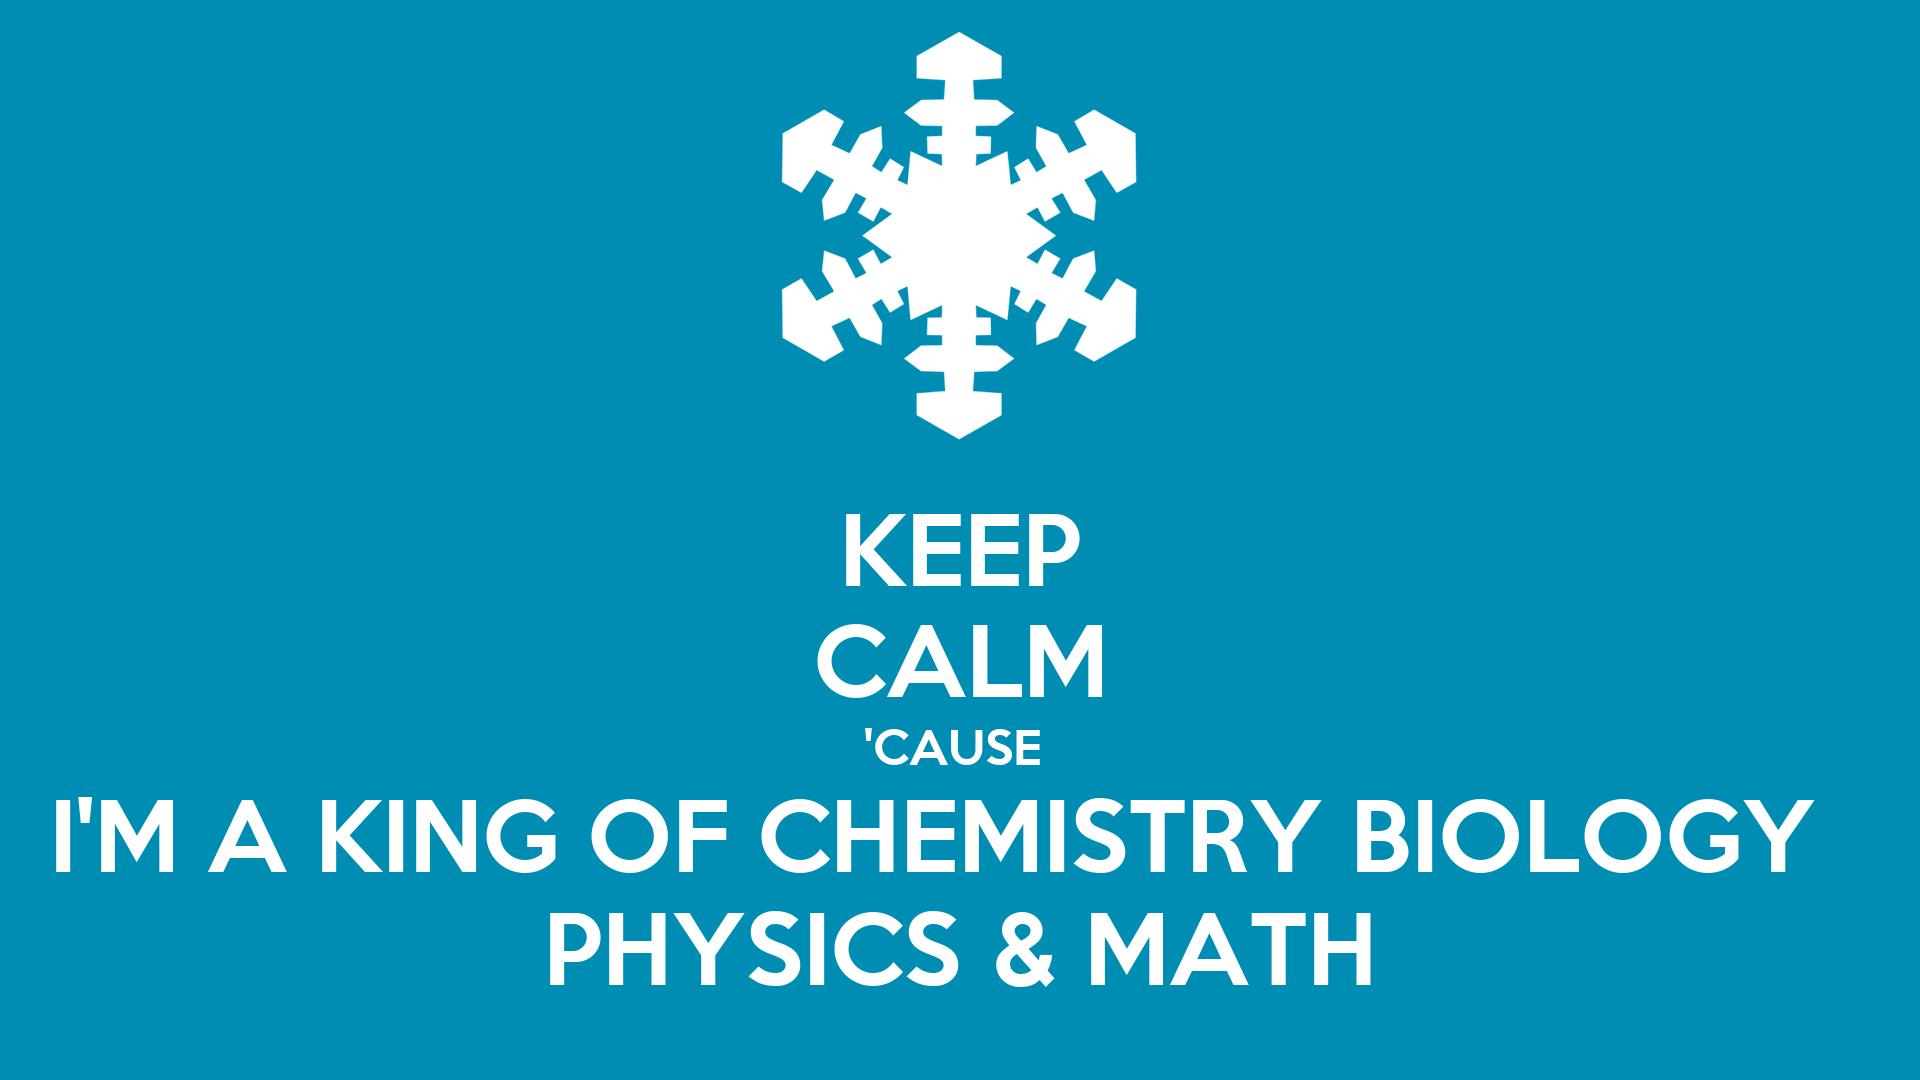 Cara Agar kamu jago Matematika, Kimia dan Fisika